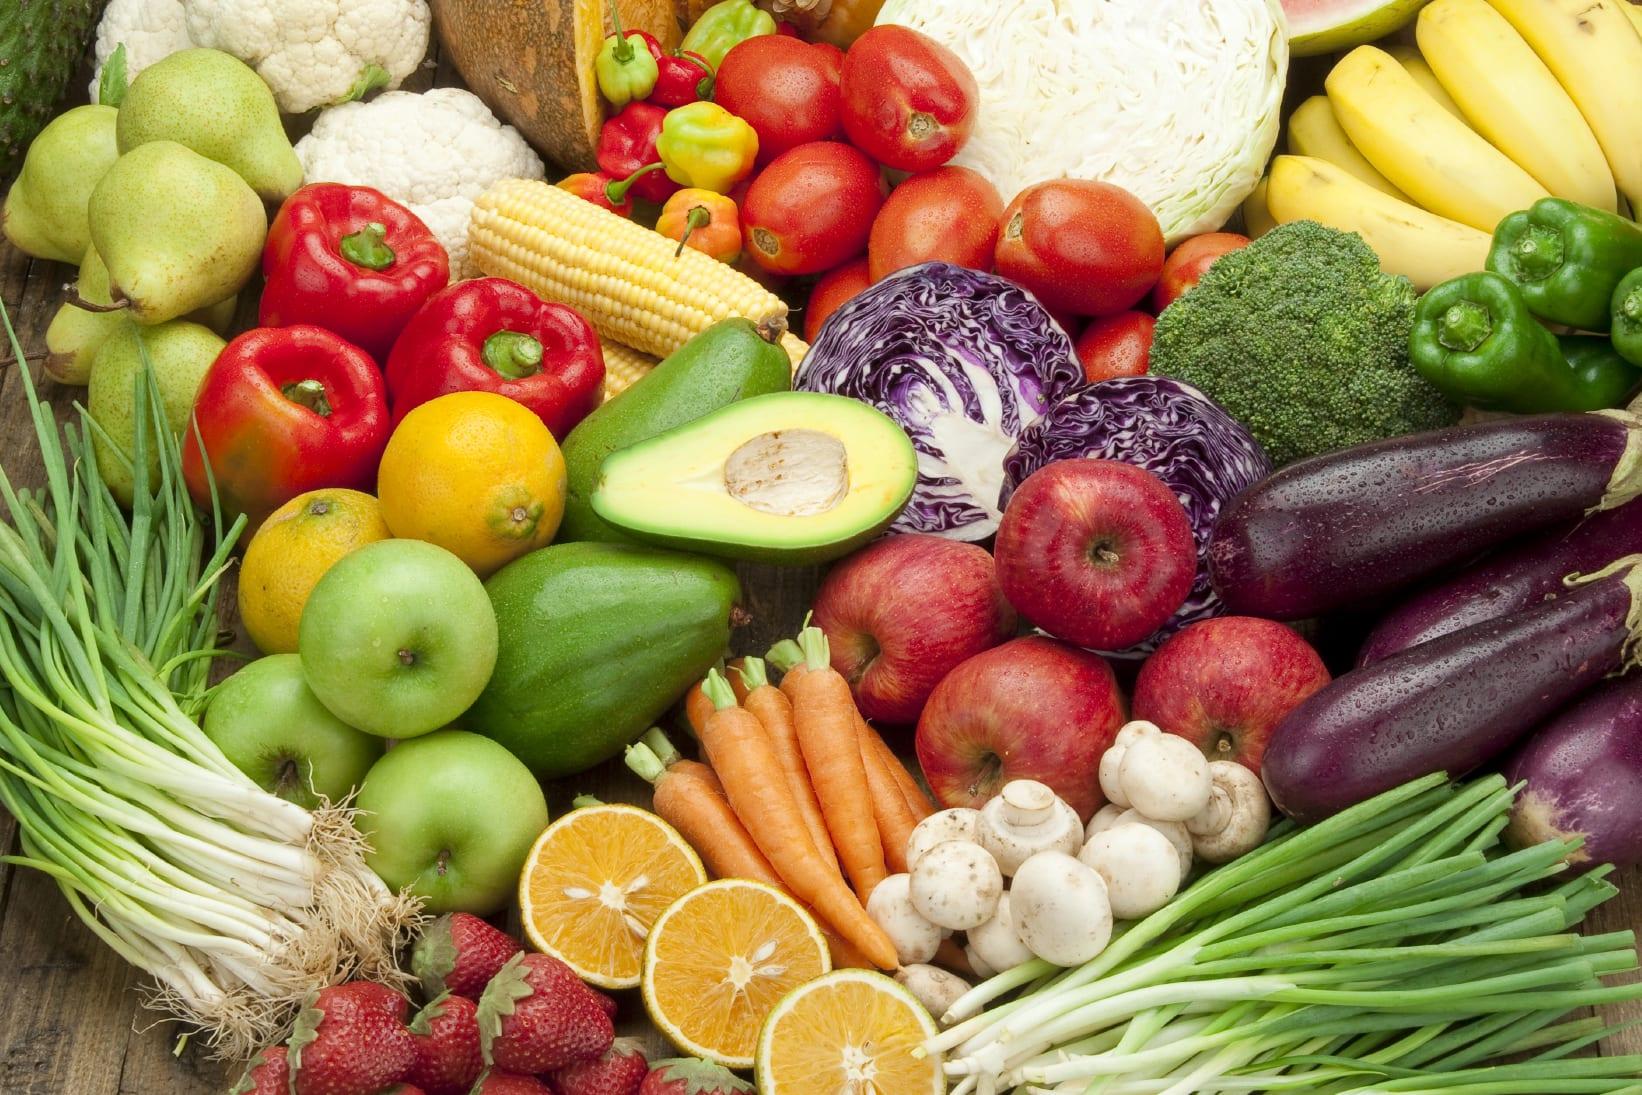 10 Foods You Should Buy Organic